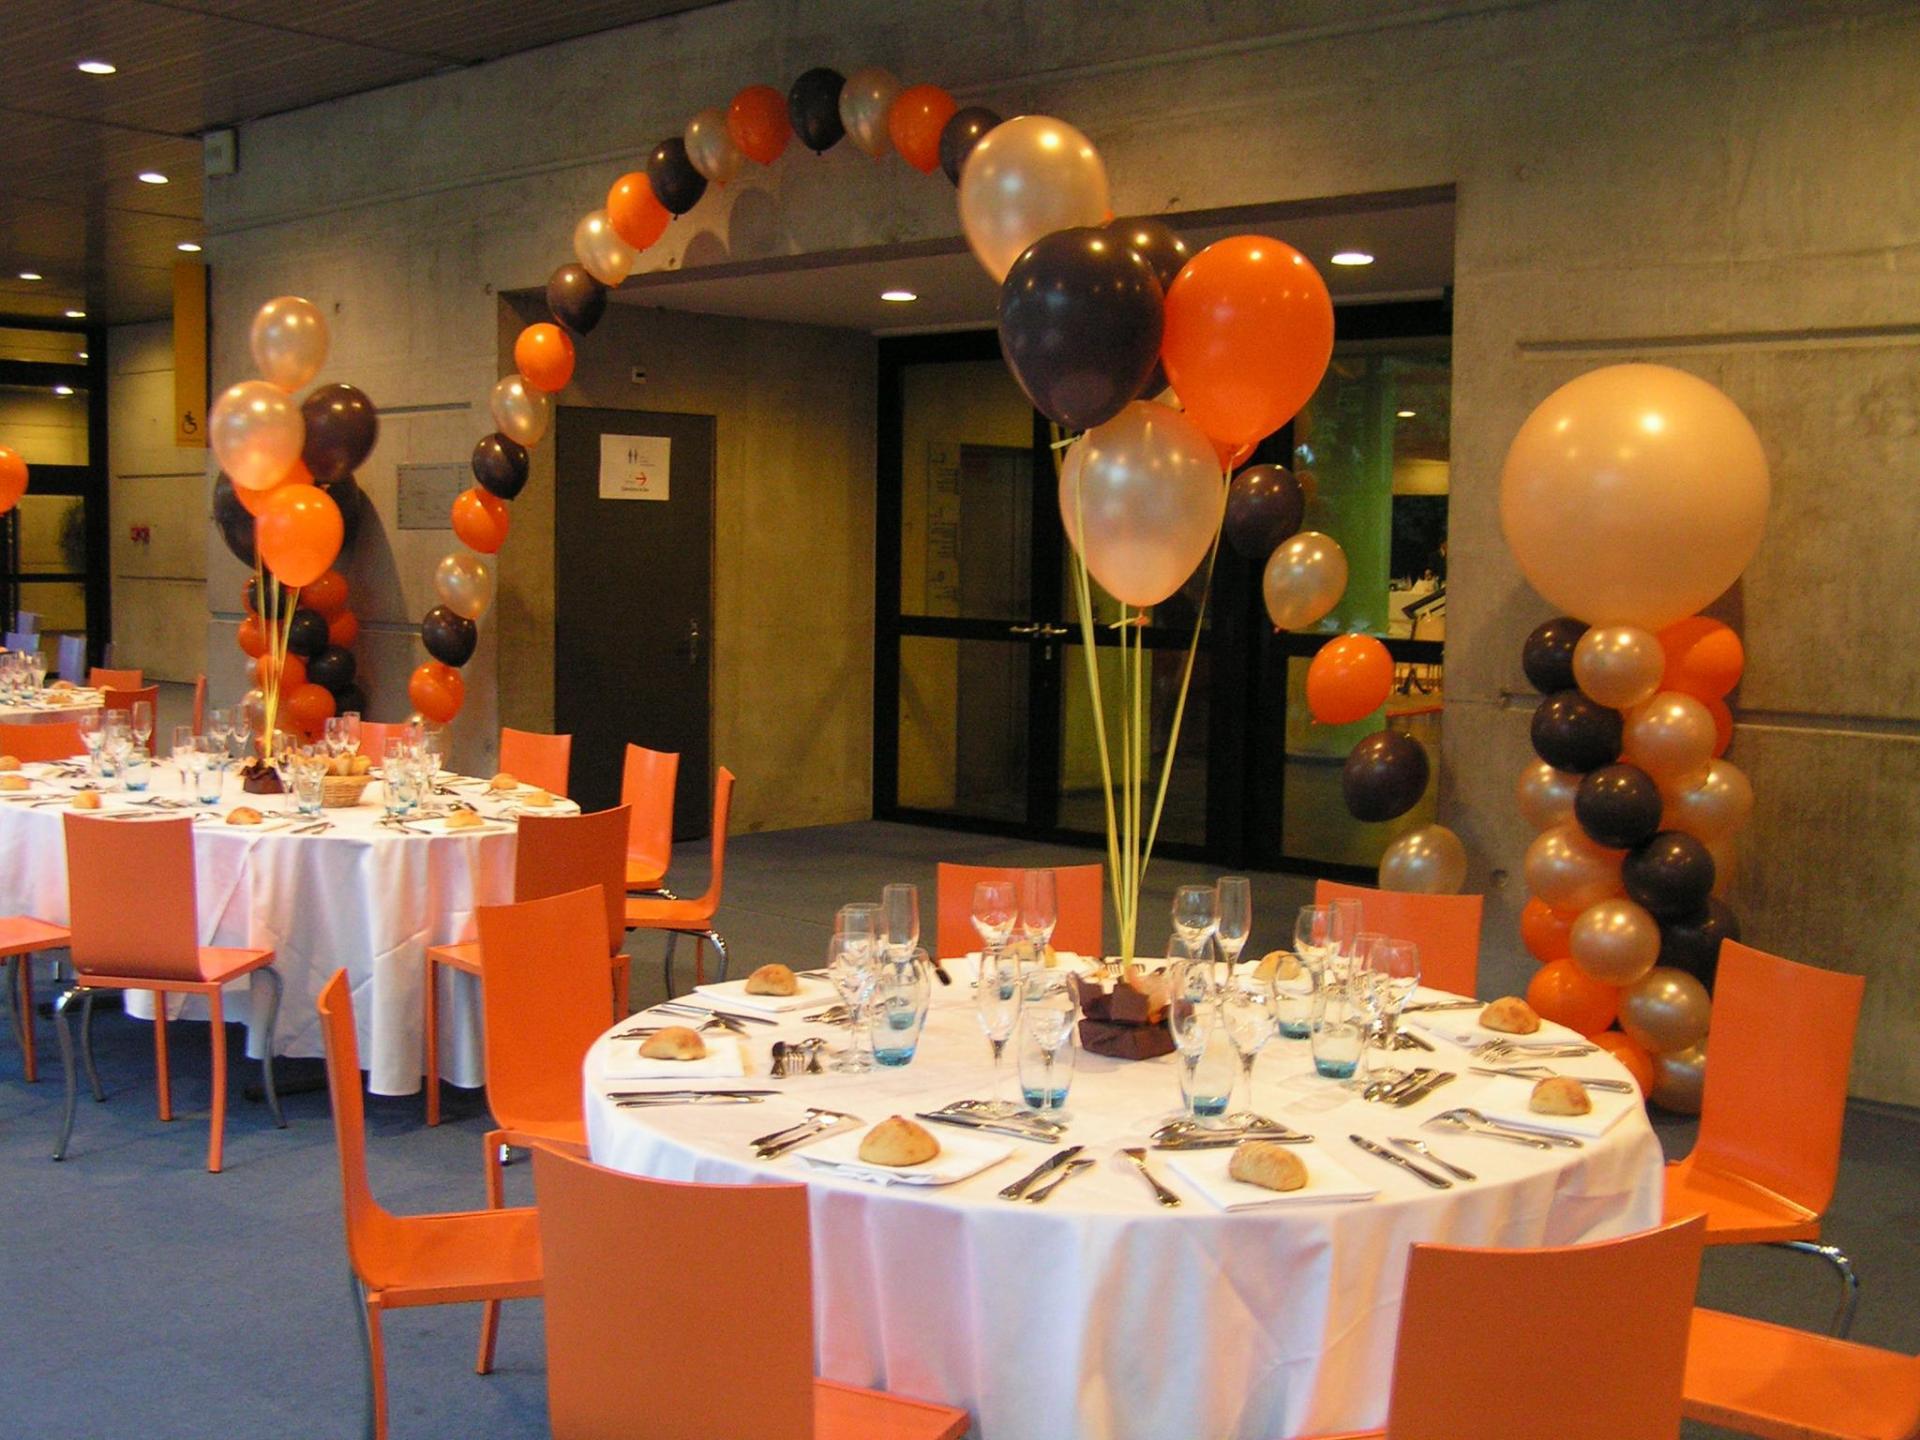 Ballon décoration salle